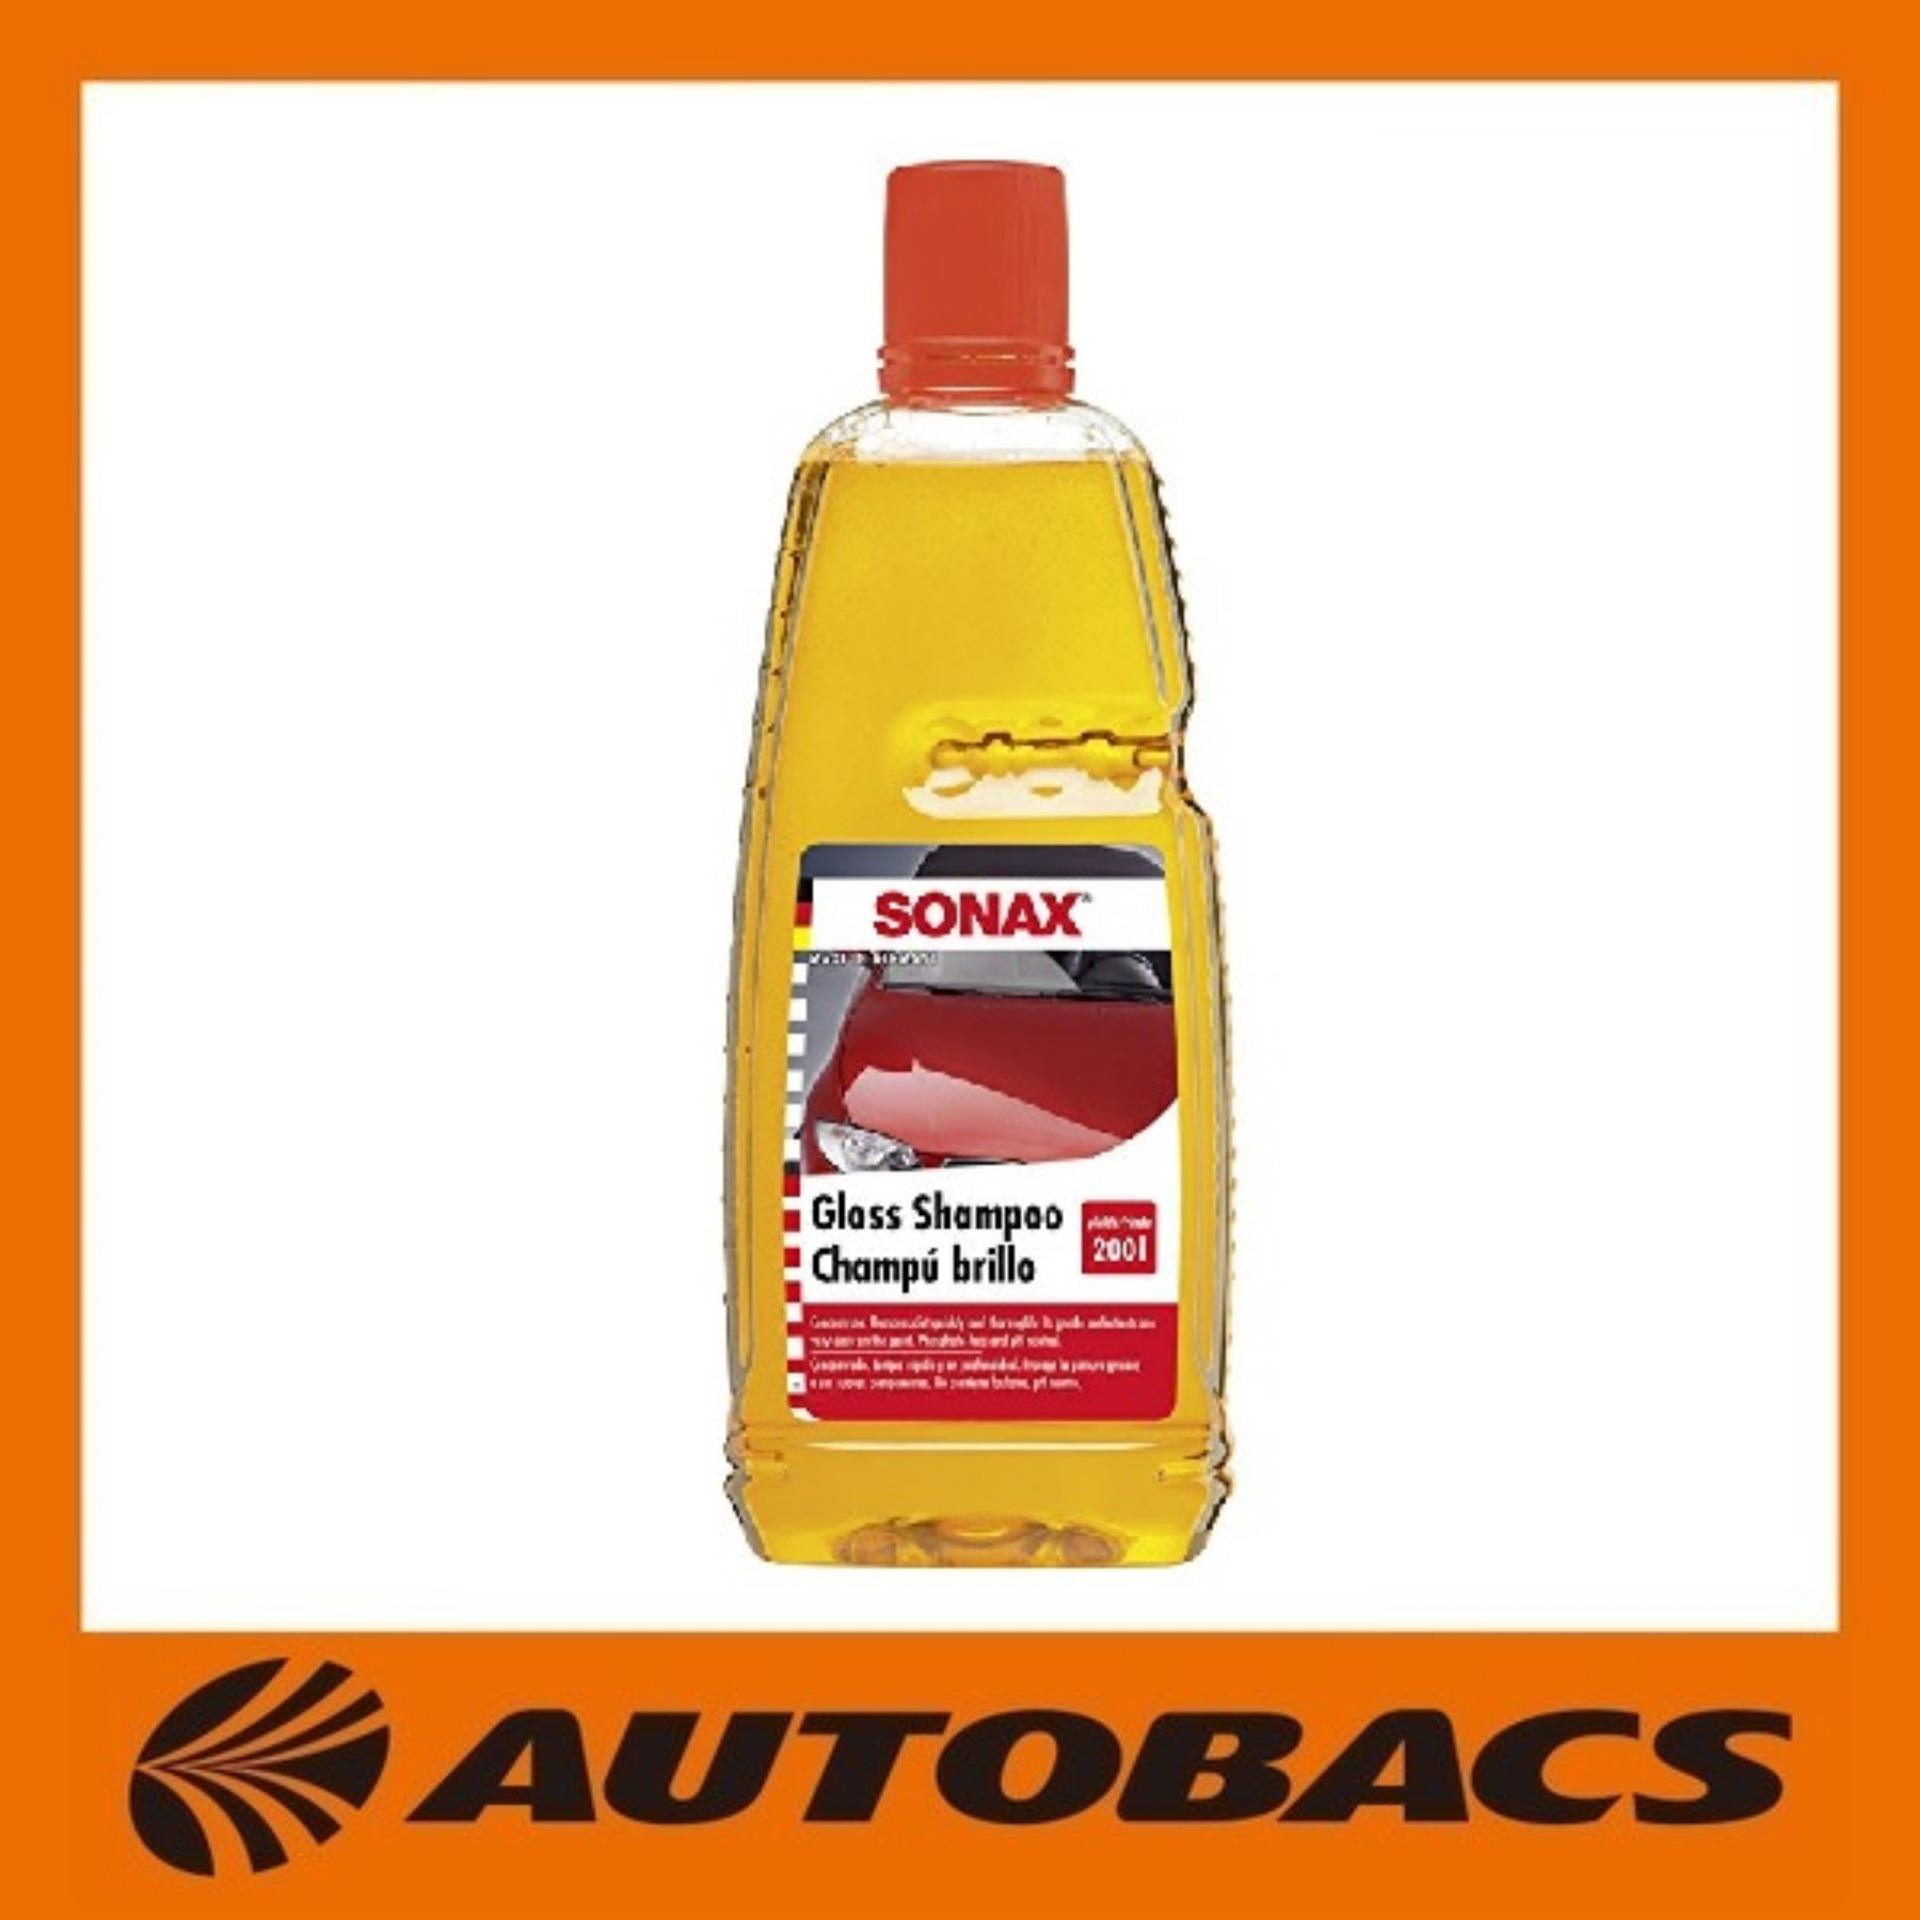 Sonax Gloss Shampoo Promo Code